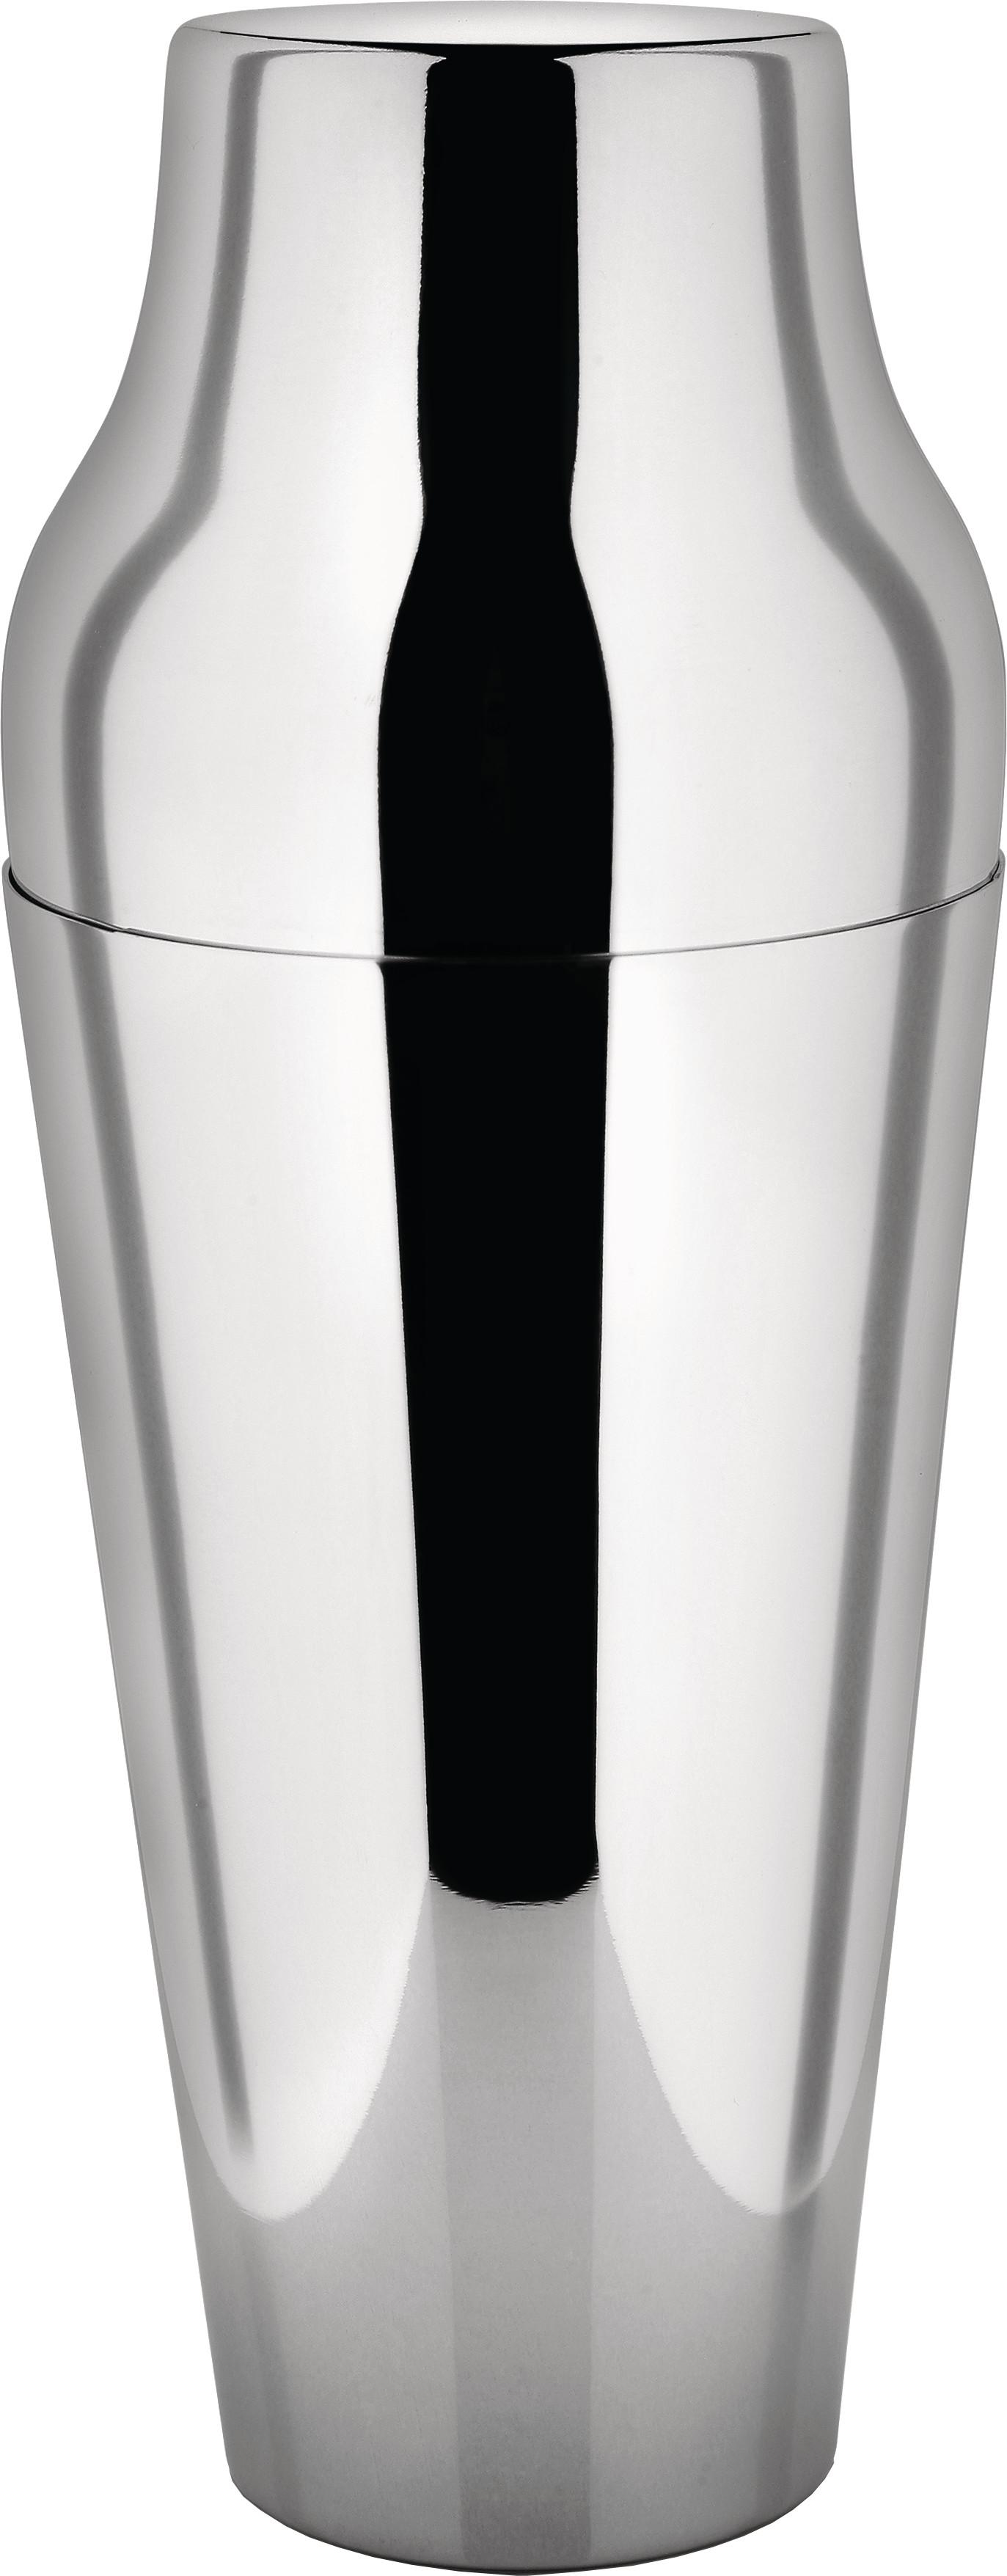 Cocktailshaker 48 cl